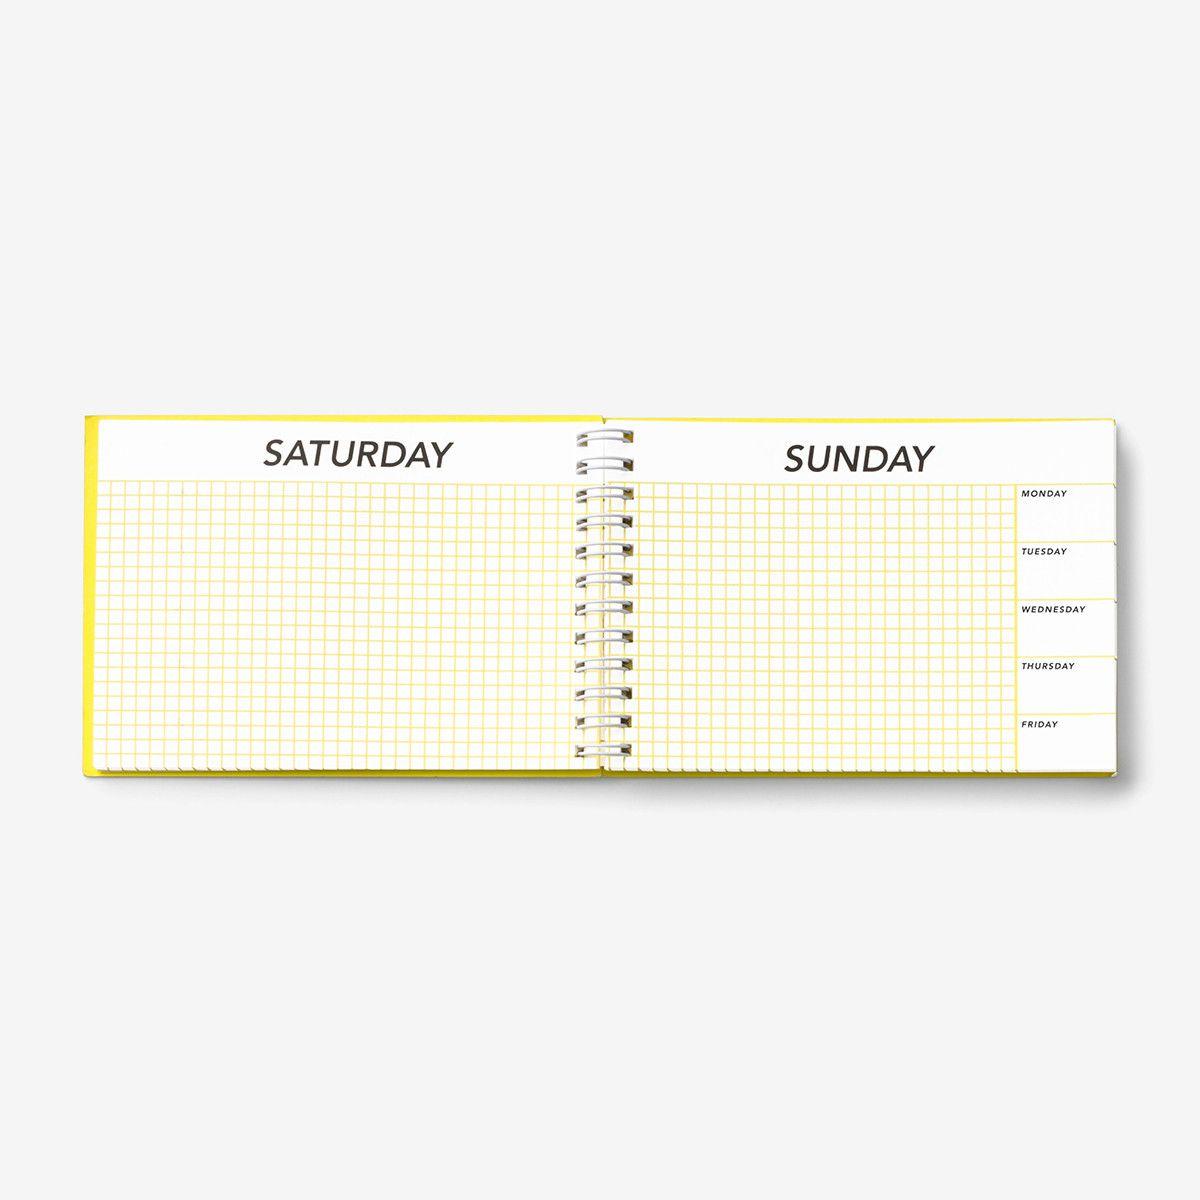 Sunday To Saturday Calendar   Calendar Printables Free Blank with regard to Weekly Calendar Sunday To Saturday